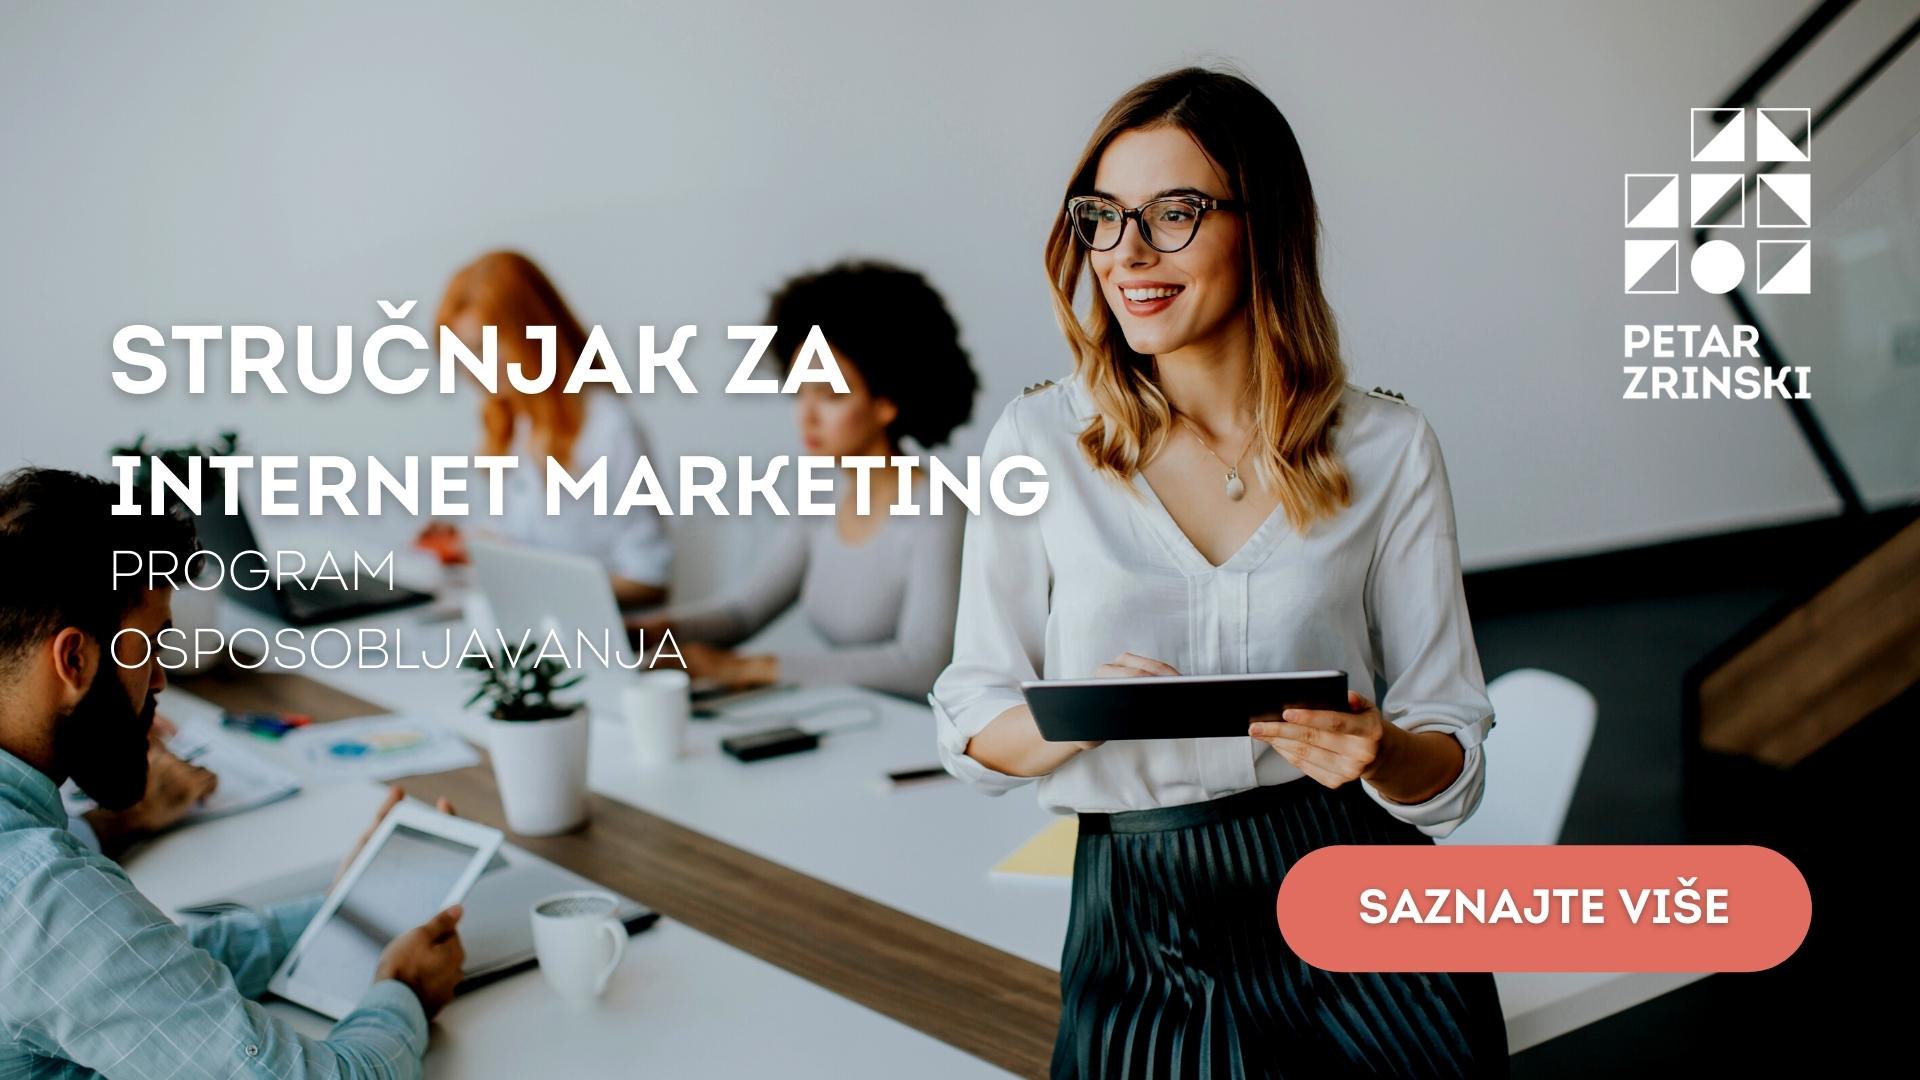 Stručnjak za Internet marketing